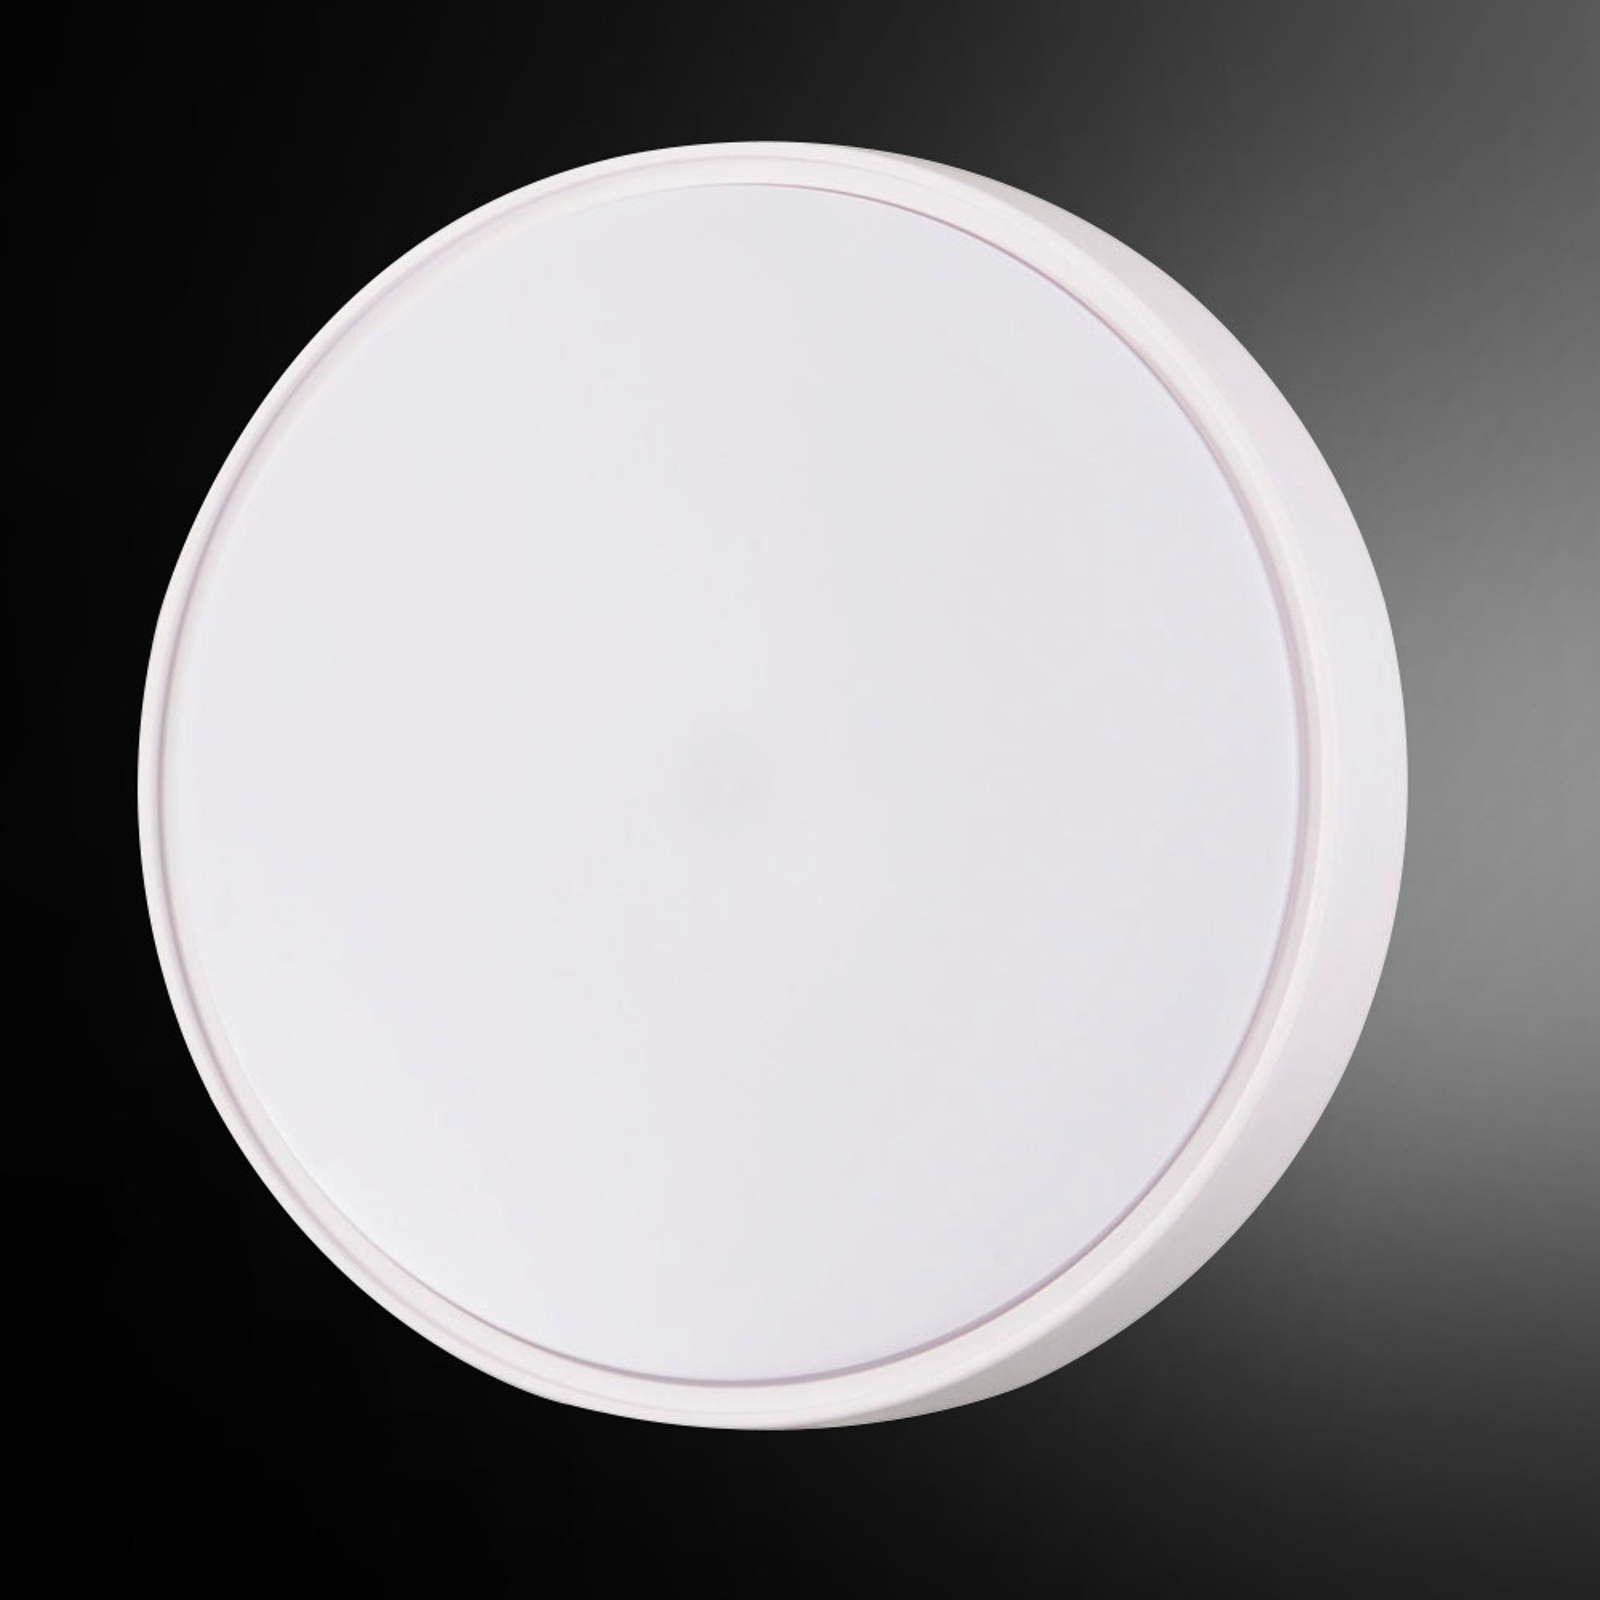 Luminoso plafón LED Hatton IP65, 30 cm